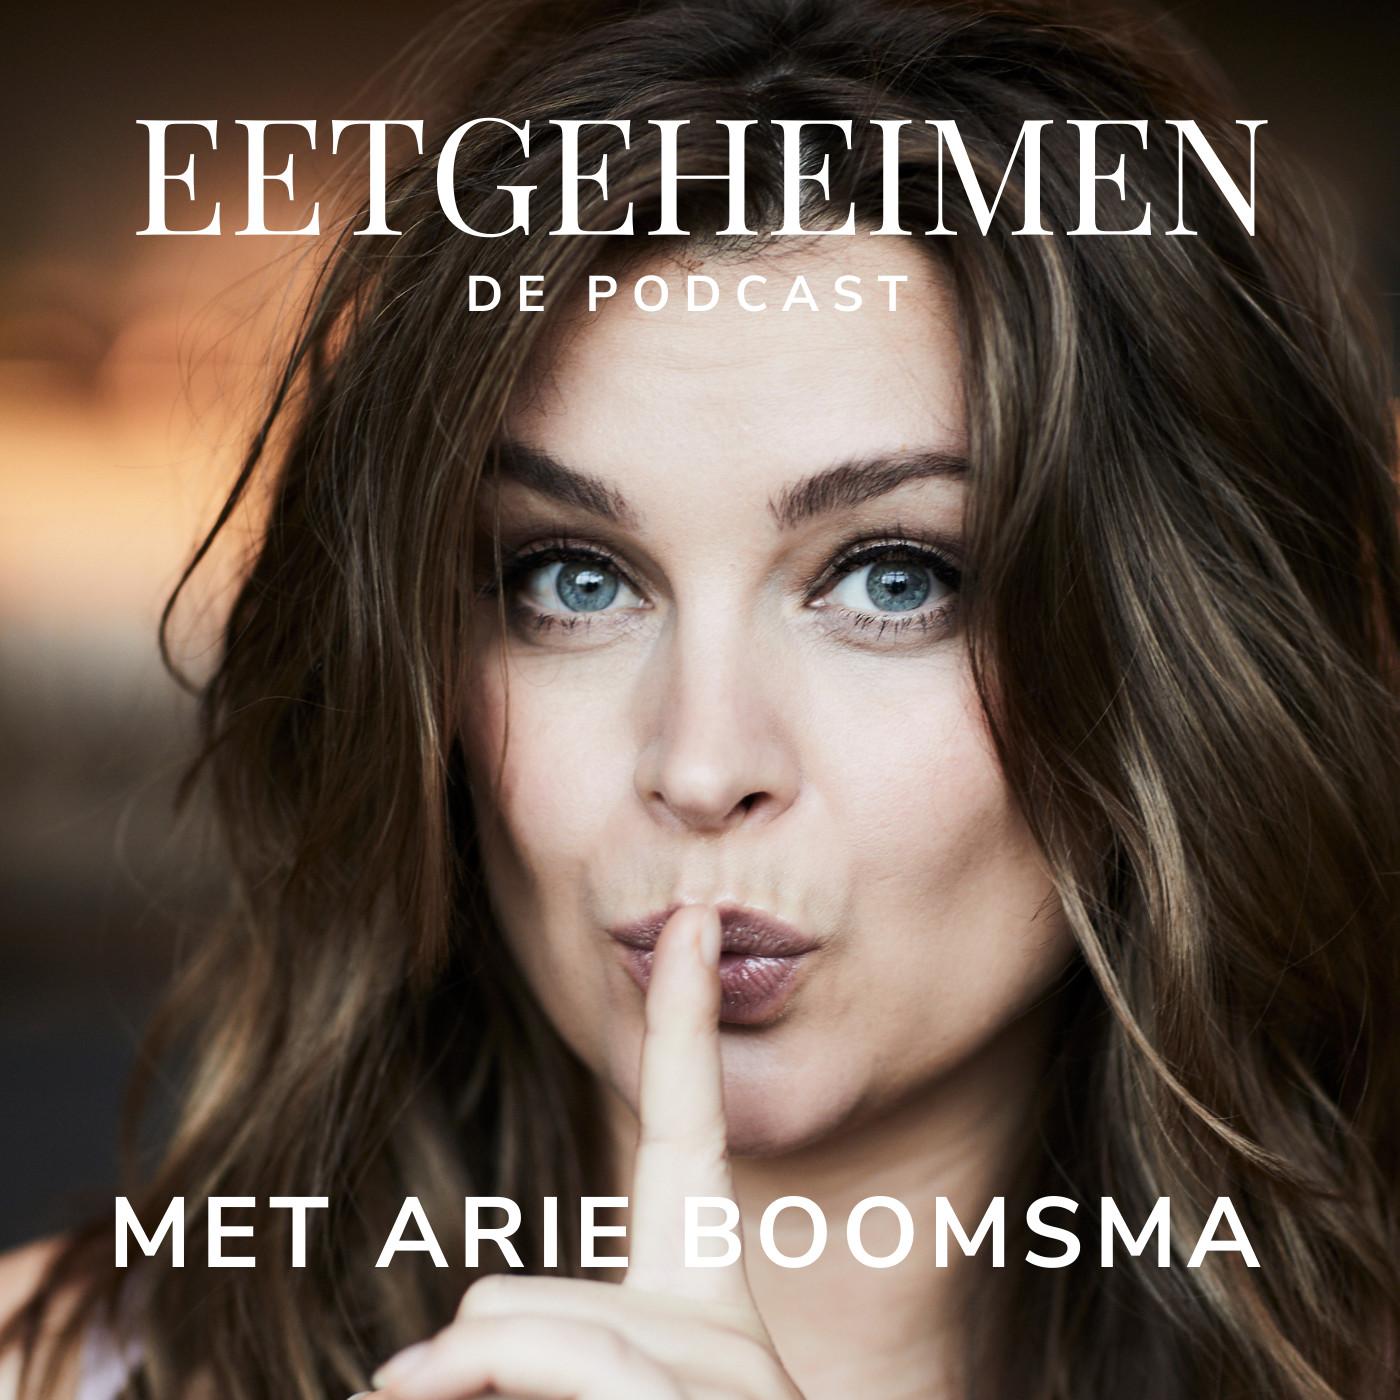 #8 - Arie Boomsma